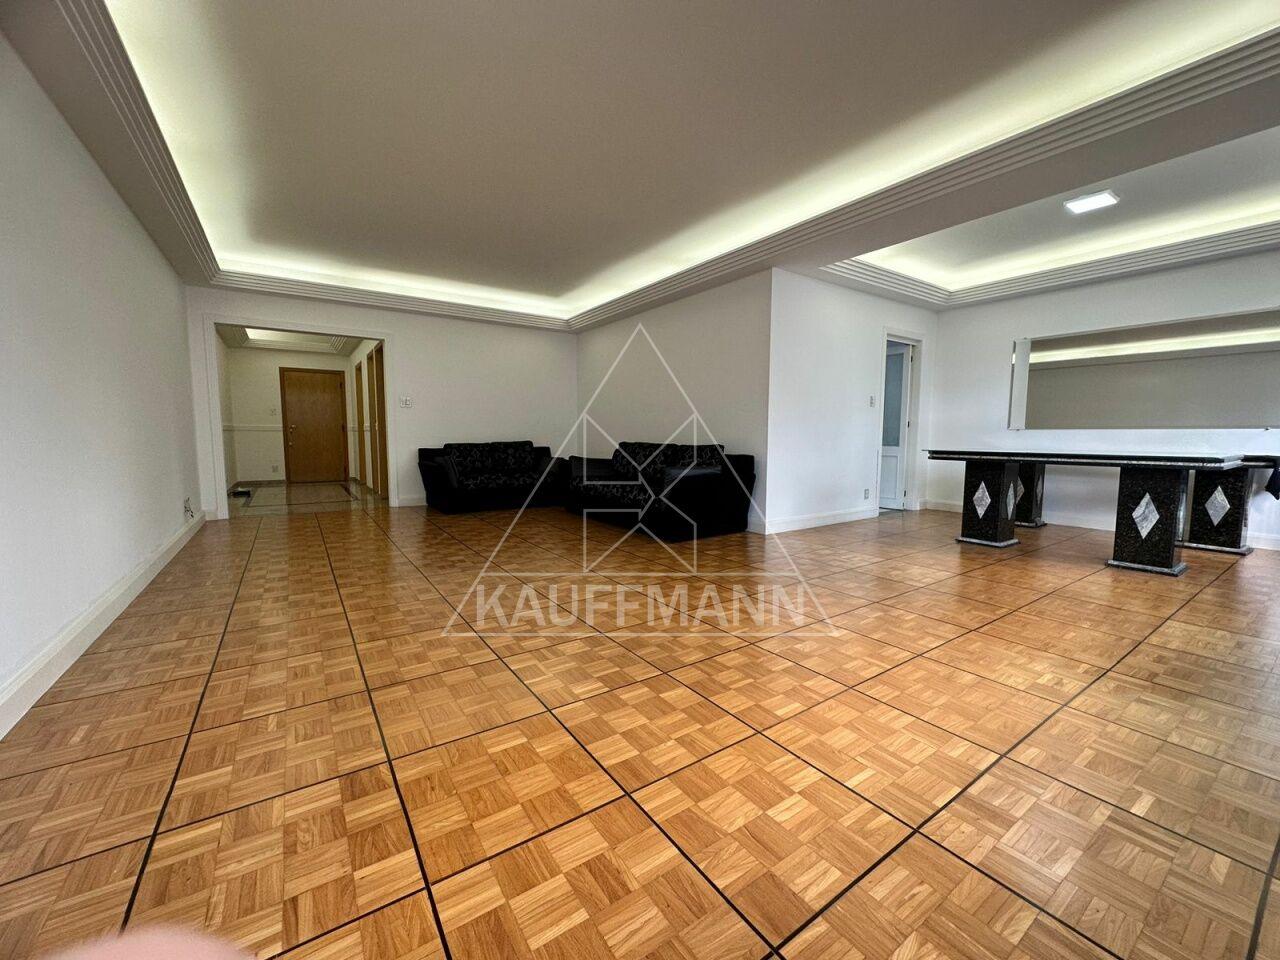 apartamento-venda-sao-paulo-higienopolis-inaja-3dormitorios-1suite-1vaga-212m2-Foto1